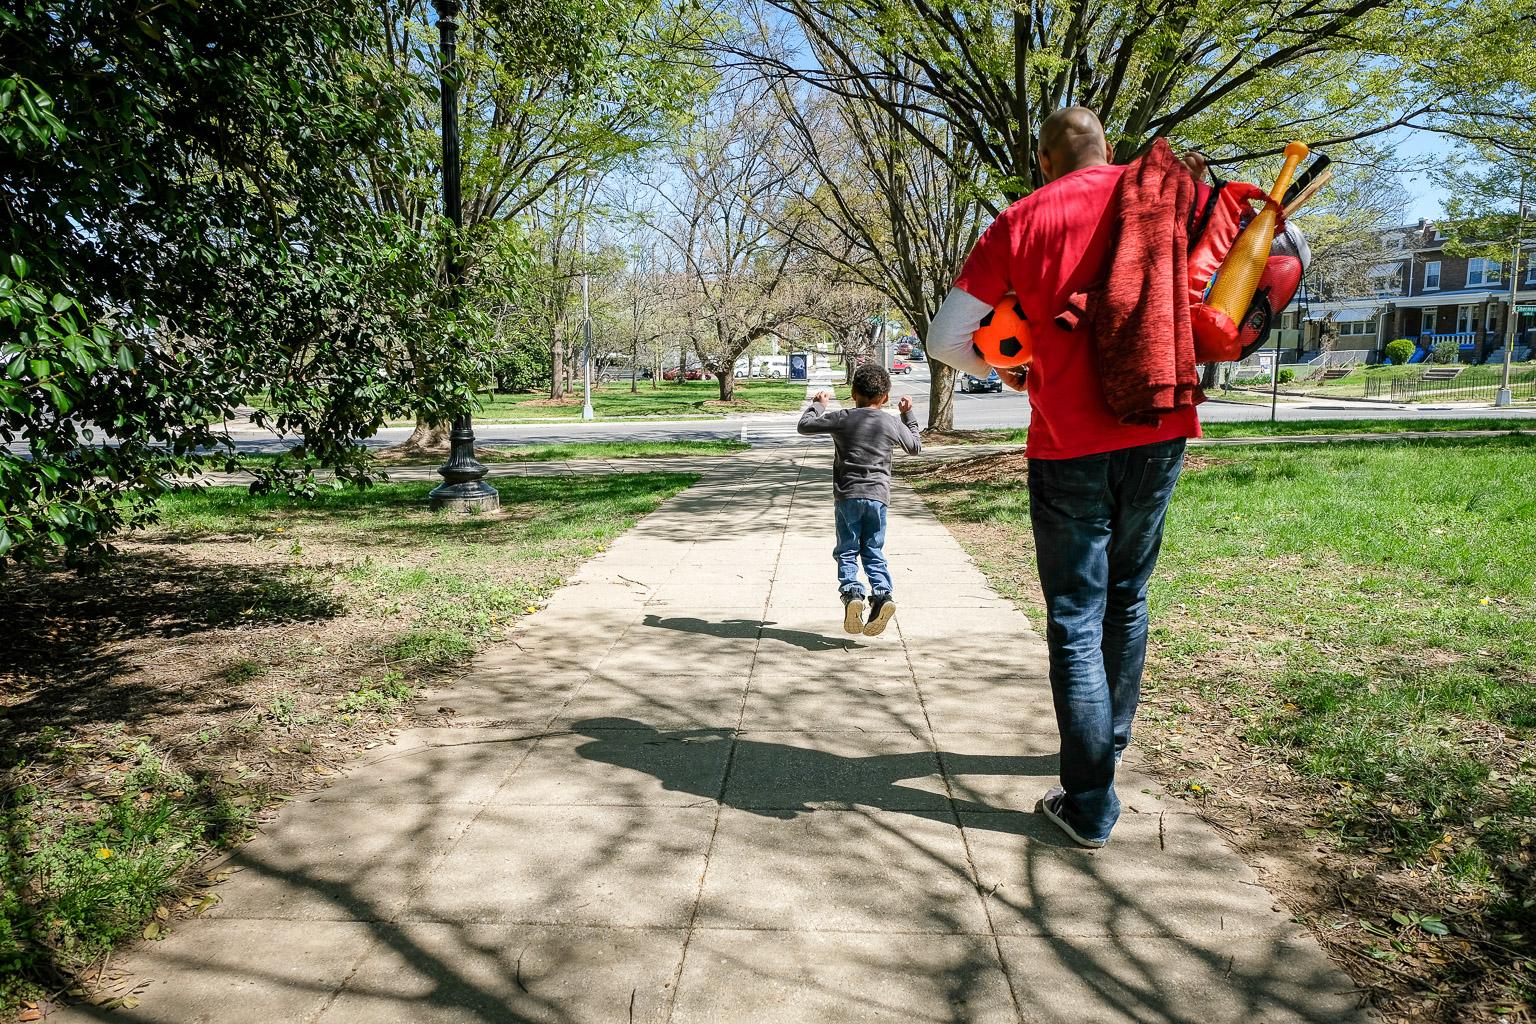 Lenzy_Ruffin_Photography_Family_Portrait_Photographer_Washington_DC__4-8-17-293.jpg